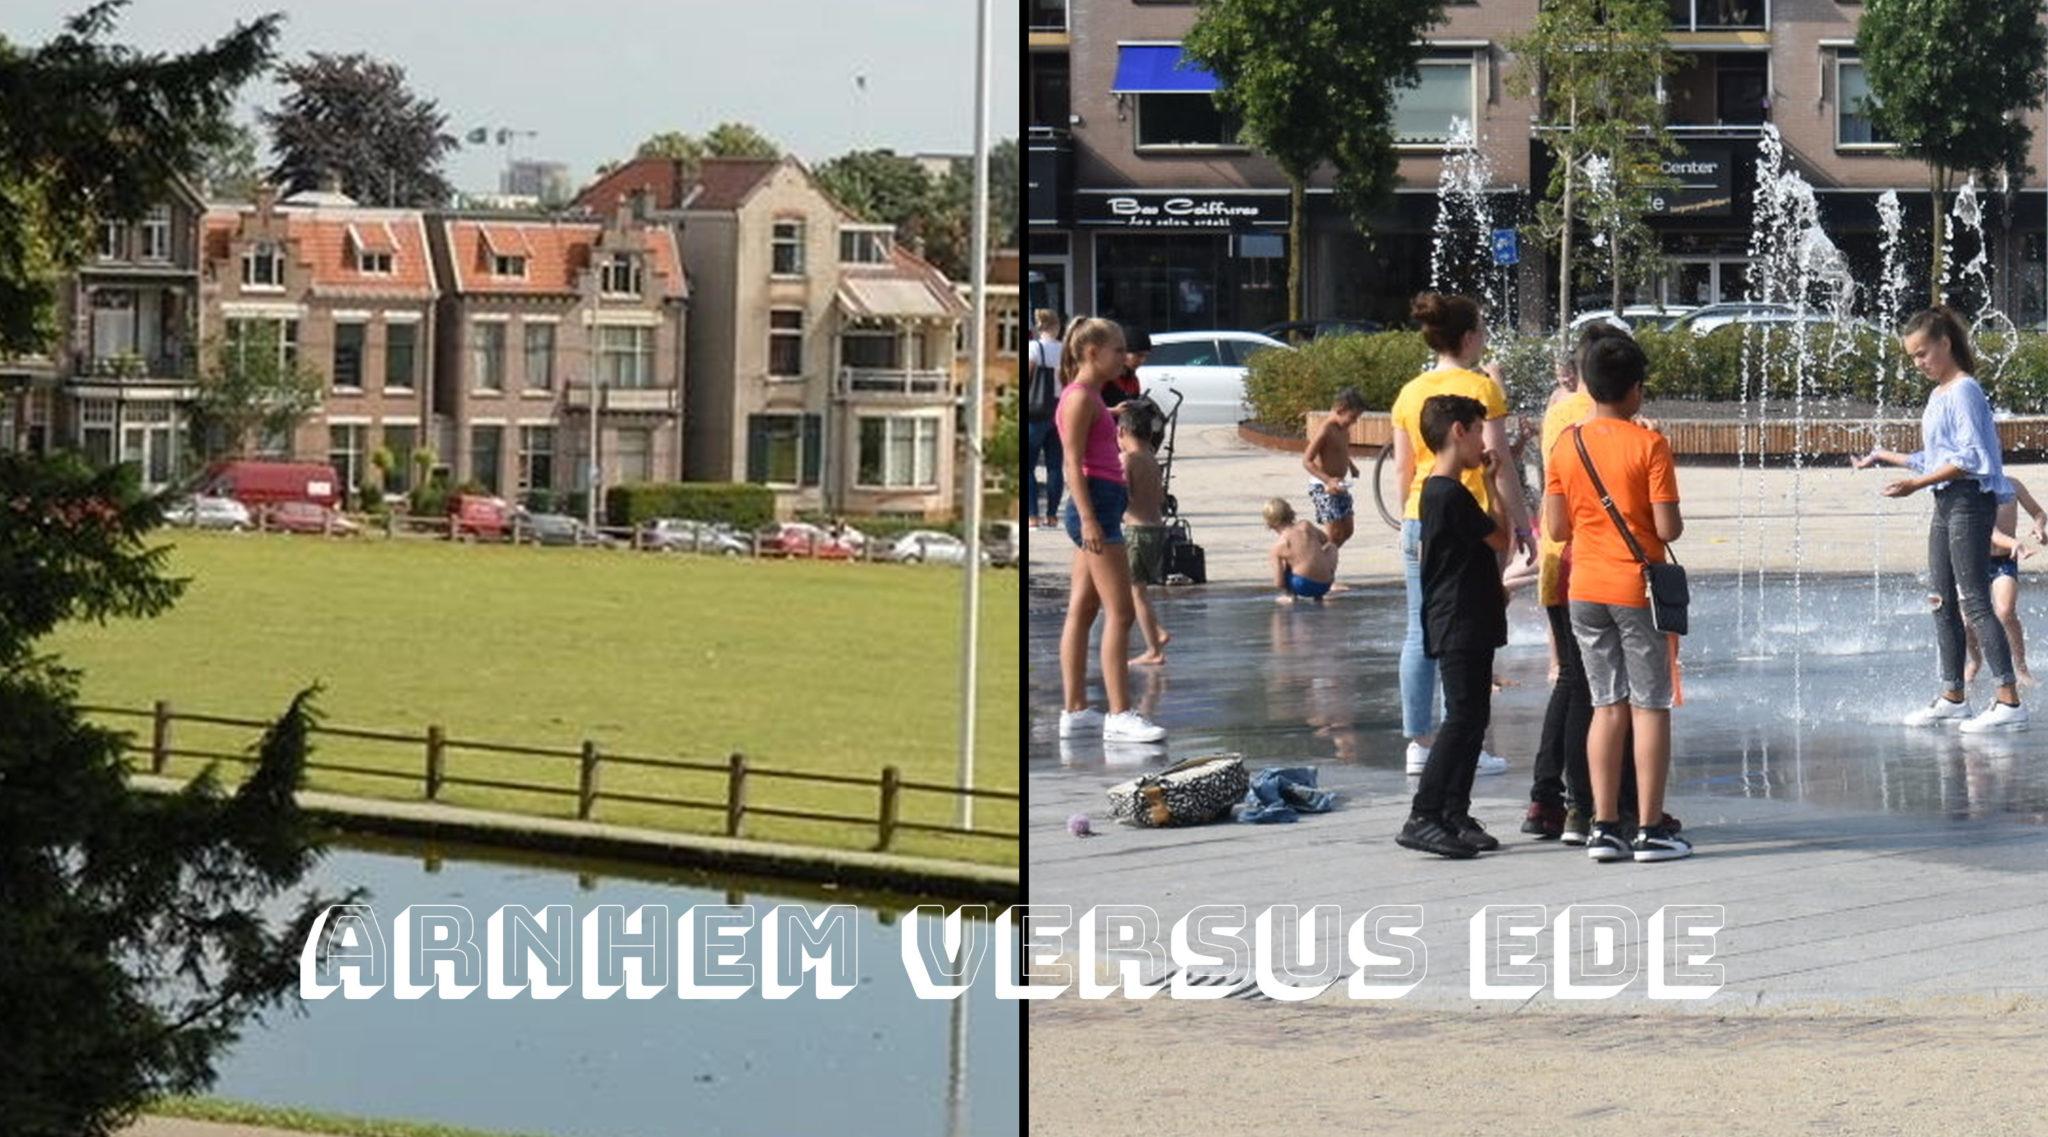 Arnhem versus Ede